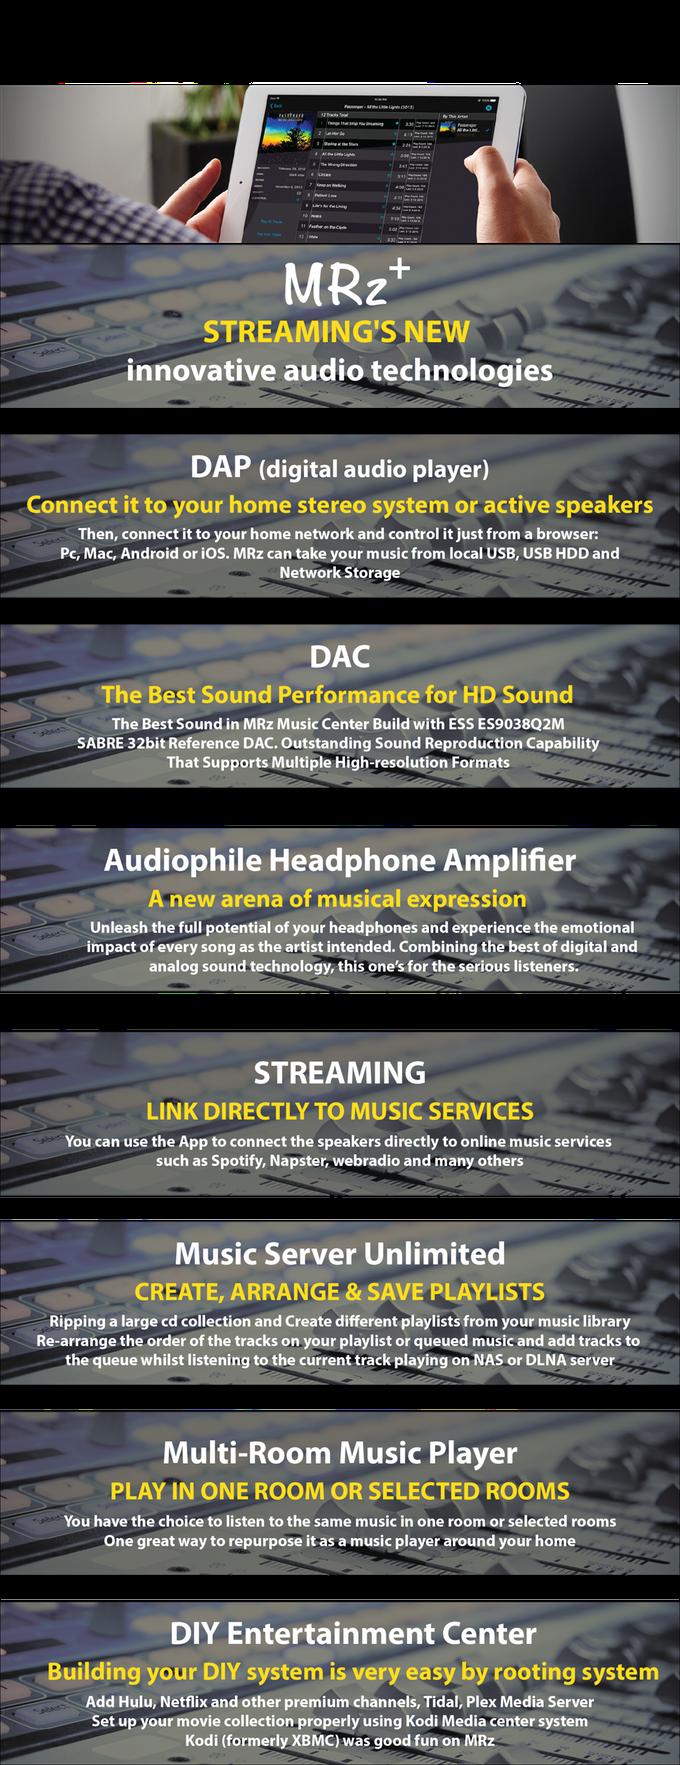 MRz UHD Music Server as the digital hub | Indiegogo